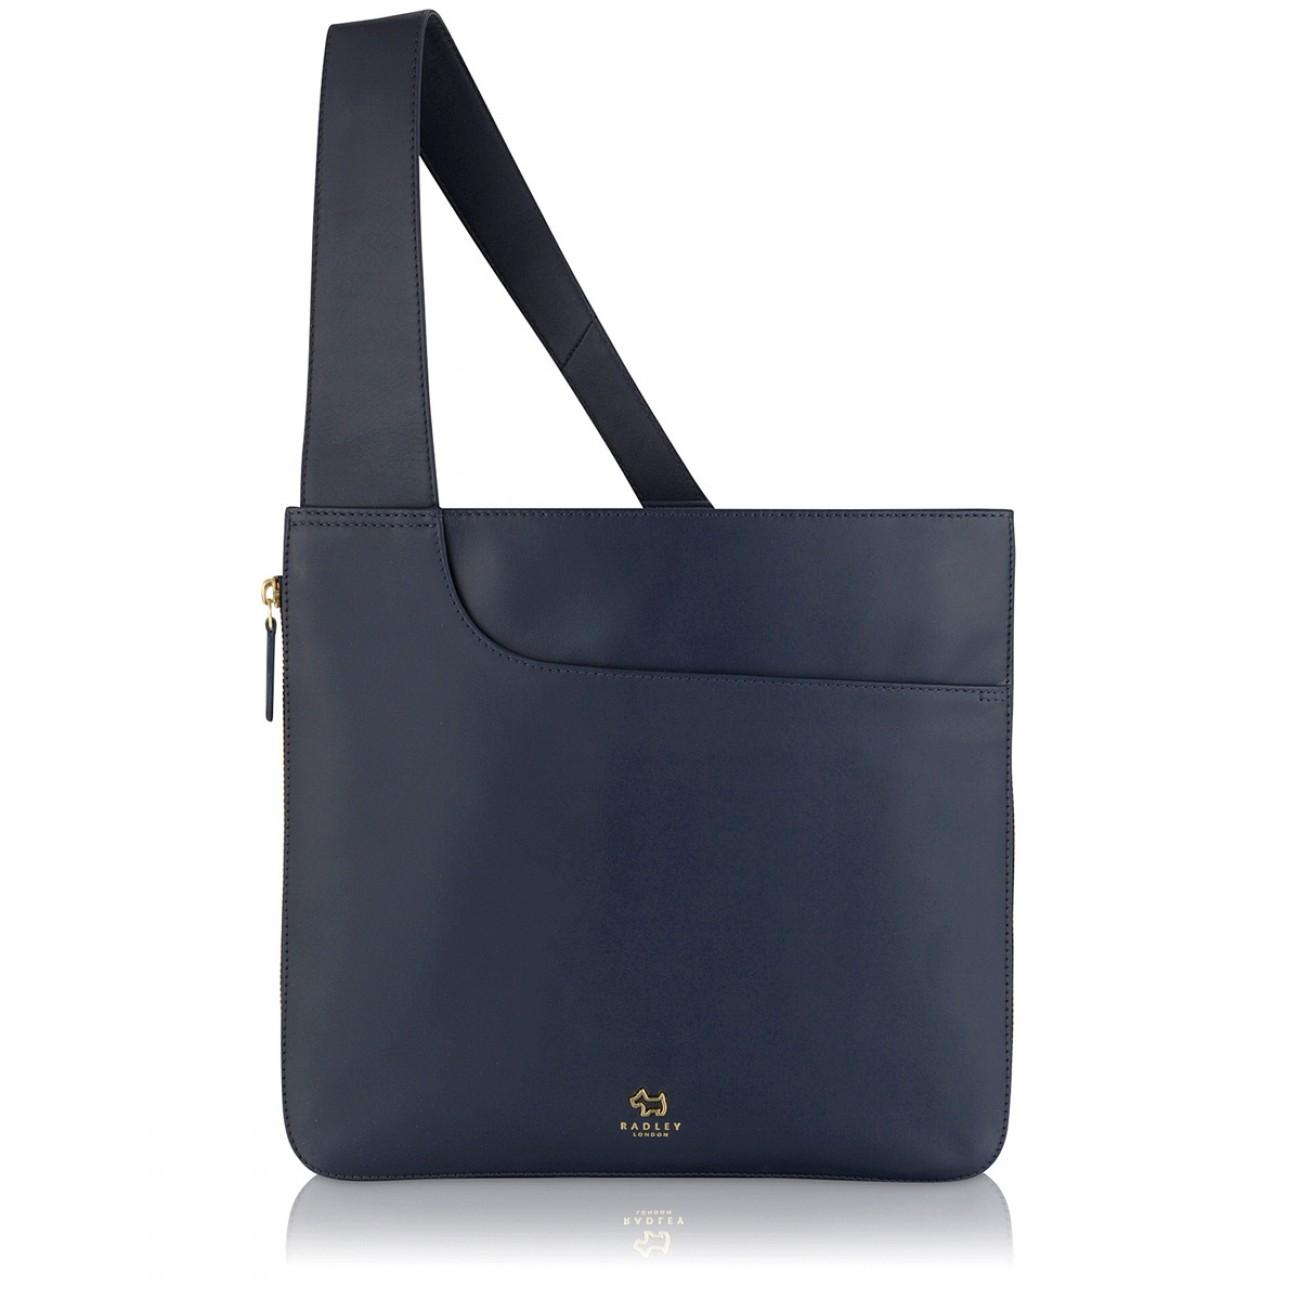 Pockets Large Zip Around Cross Body Bag